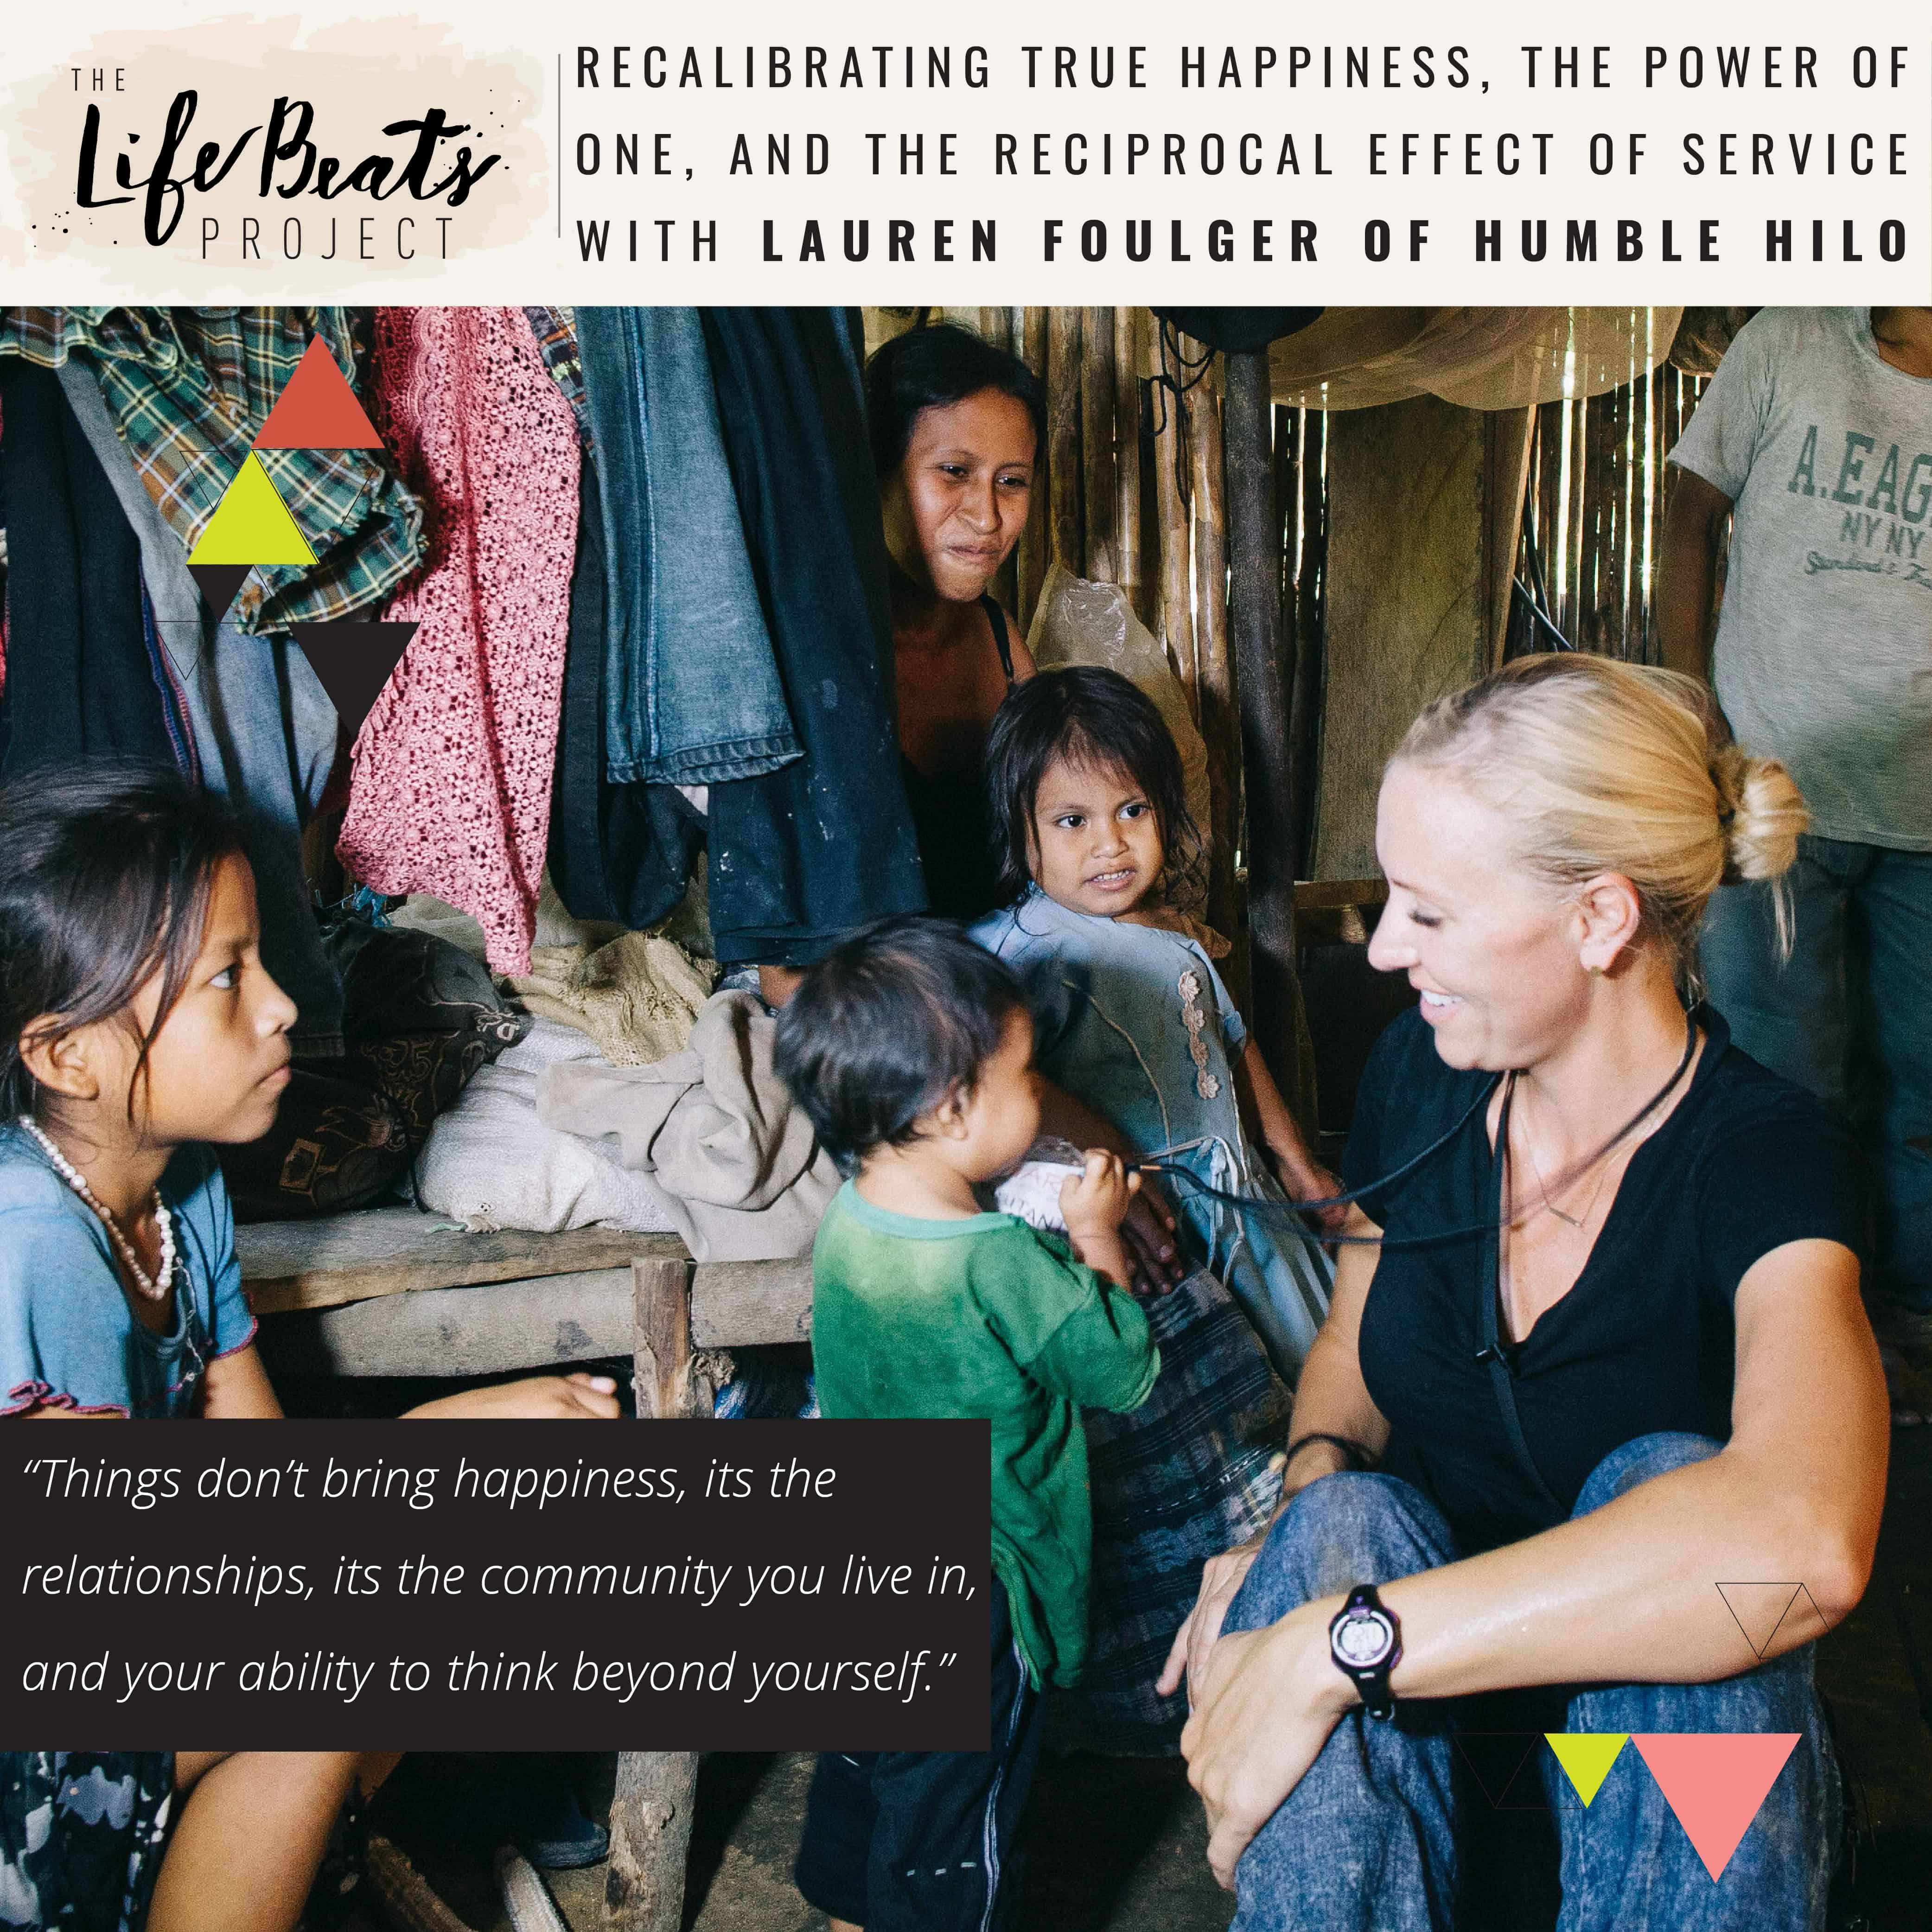 Humble Hilo Guatemala service charity microfinance malnutrition world link partners happiness